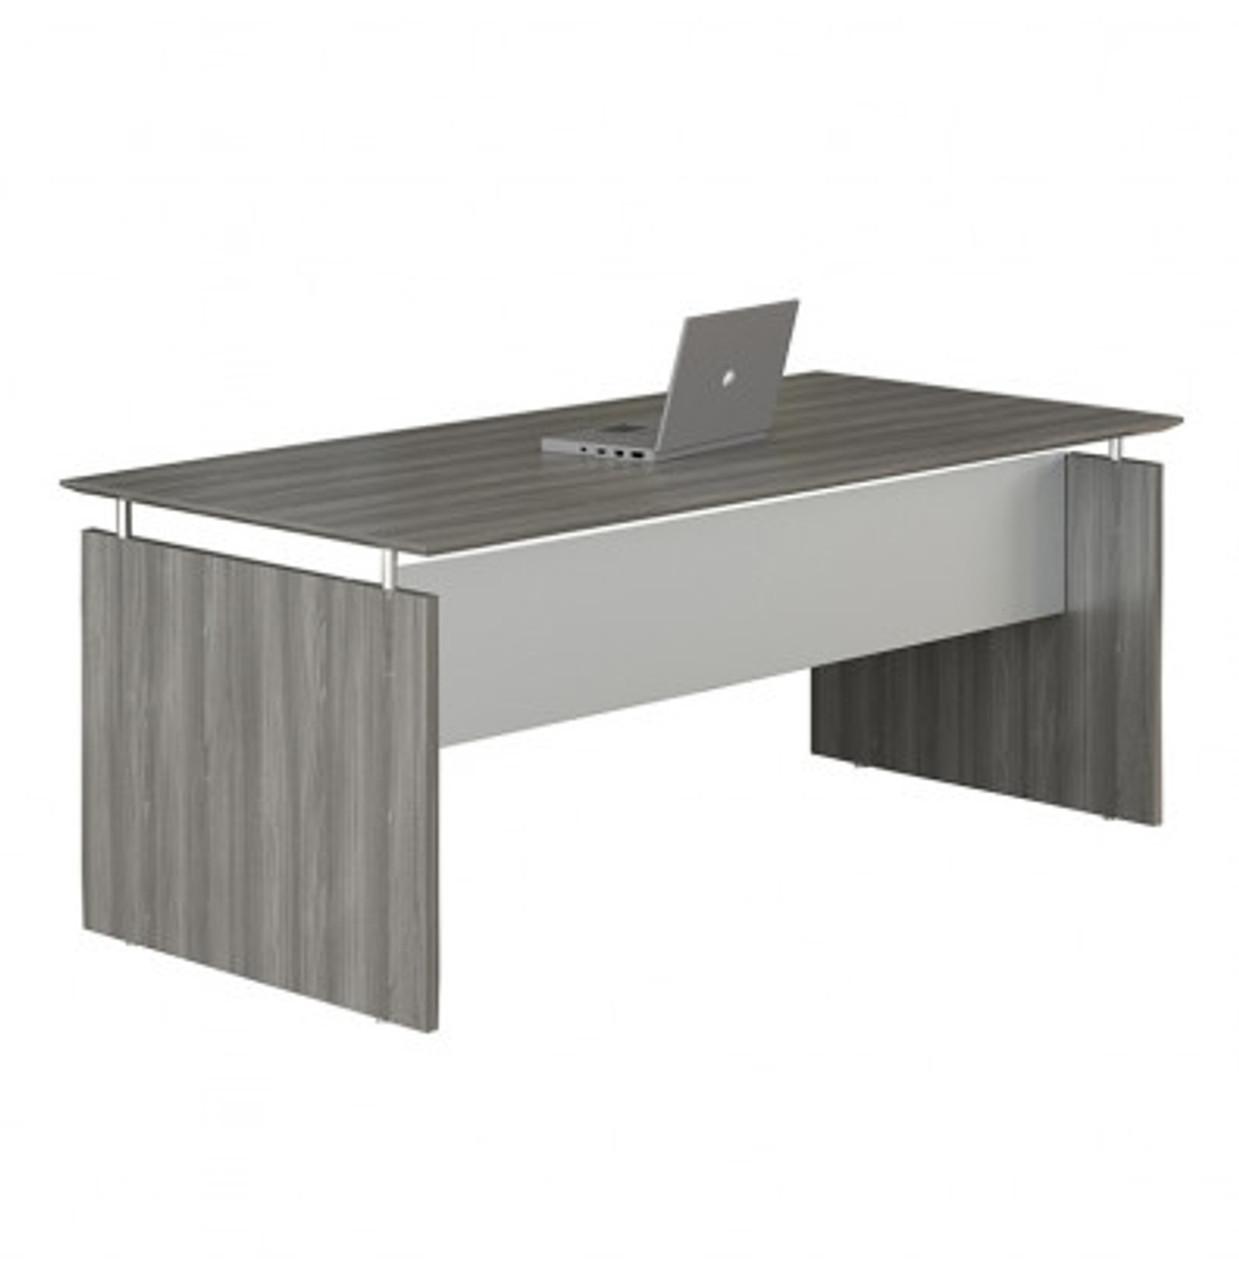 "Mayline Medina 35"" x 35"" Straight Front Gray Steel Laminate Desk"